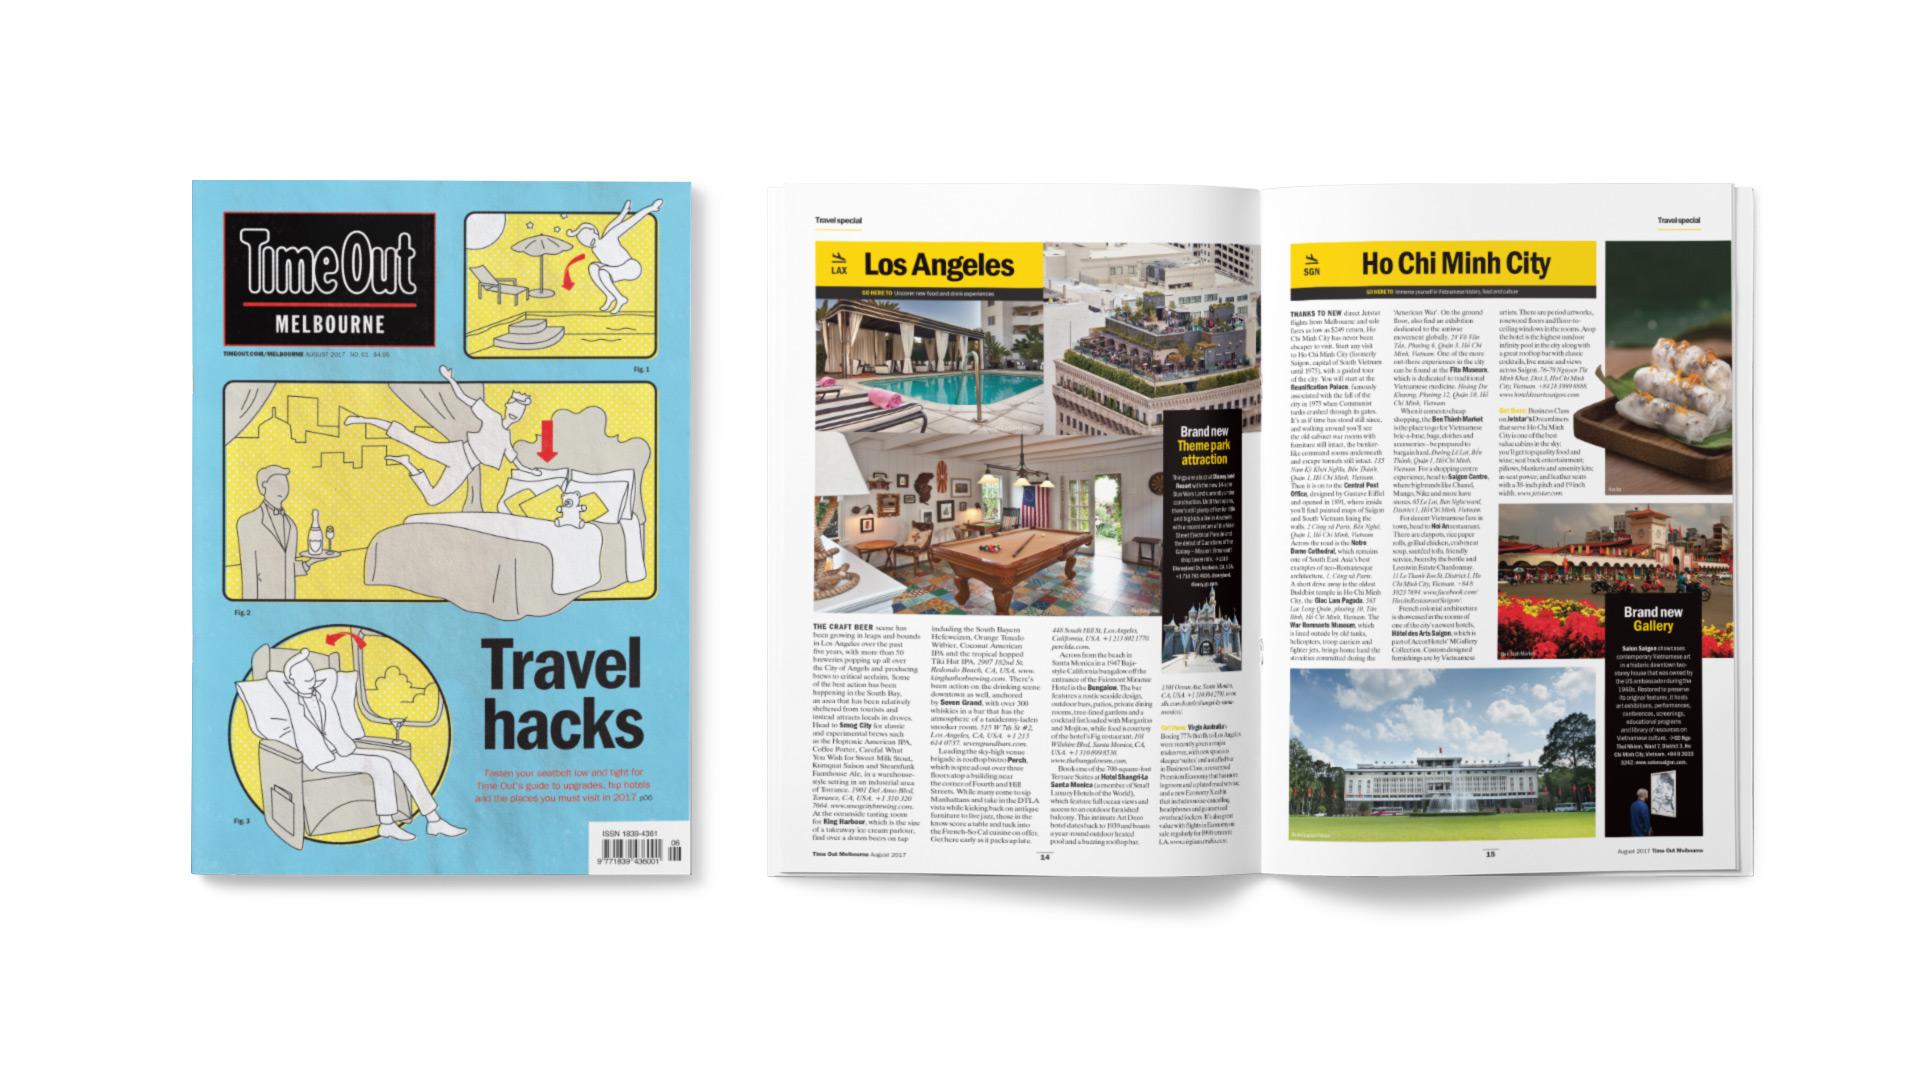 time-out-mel-magazine-travel-hack-61.jpg